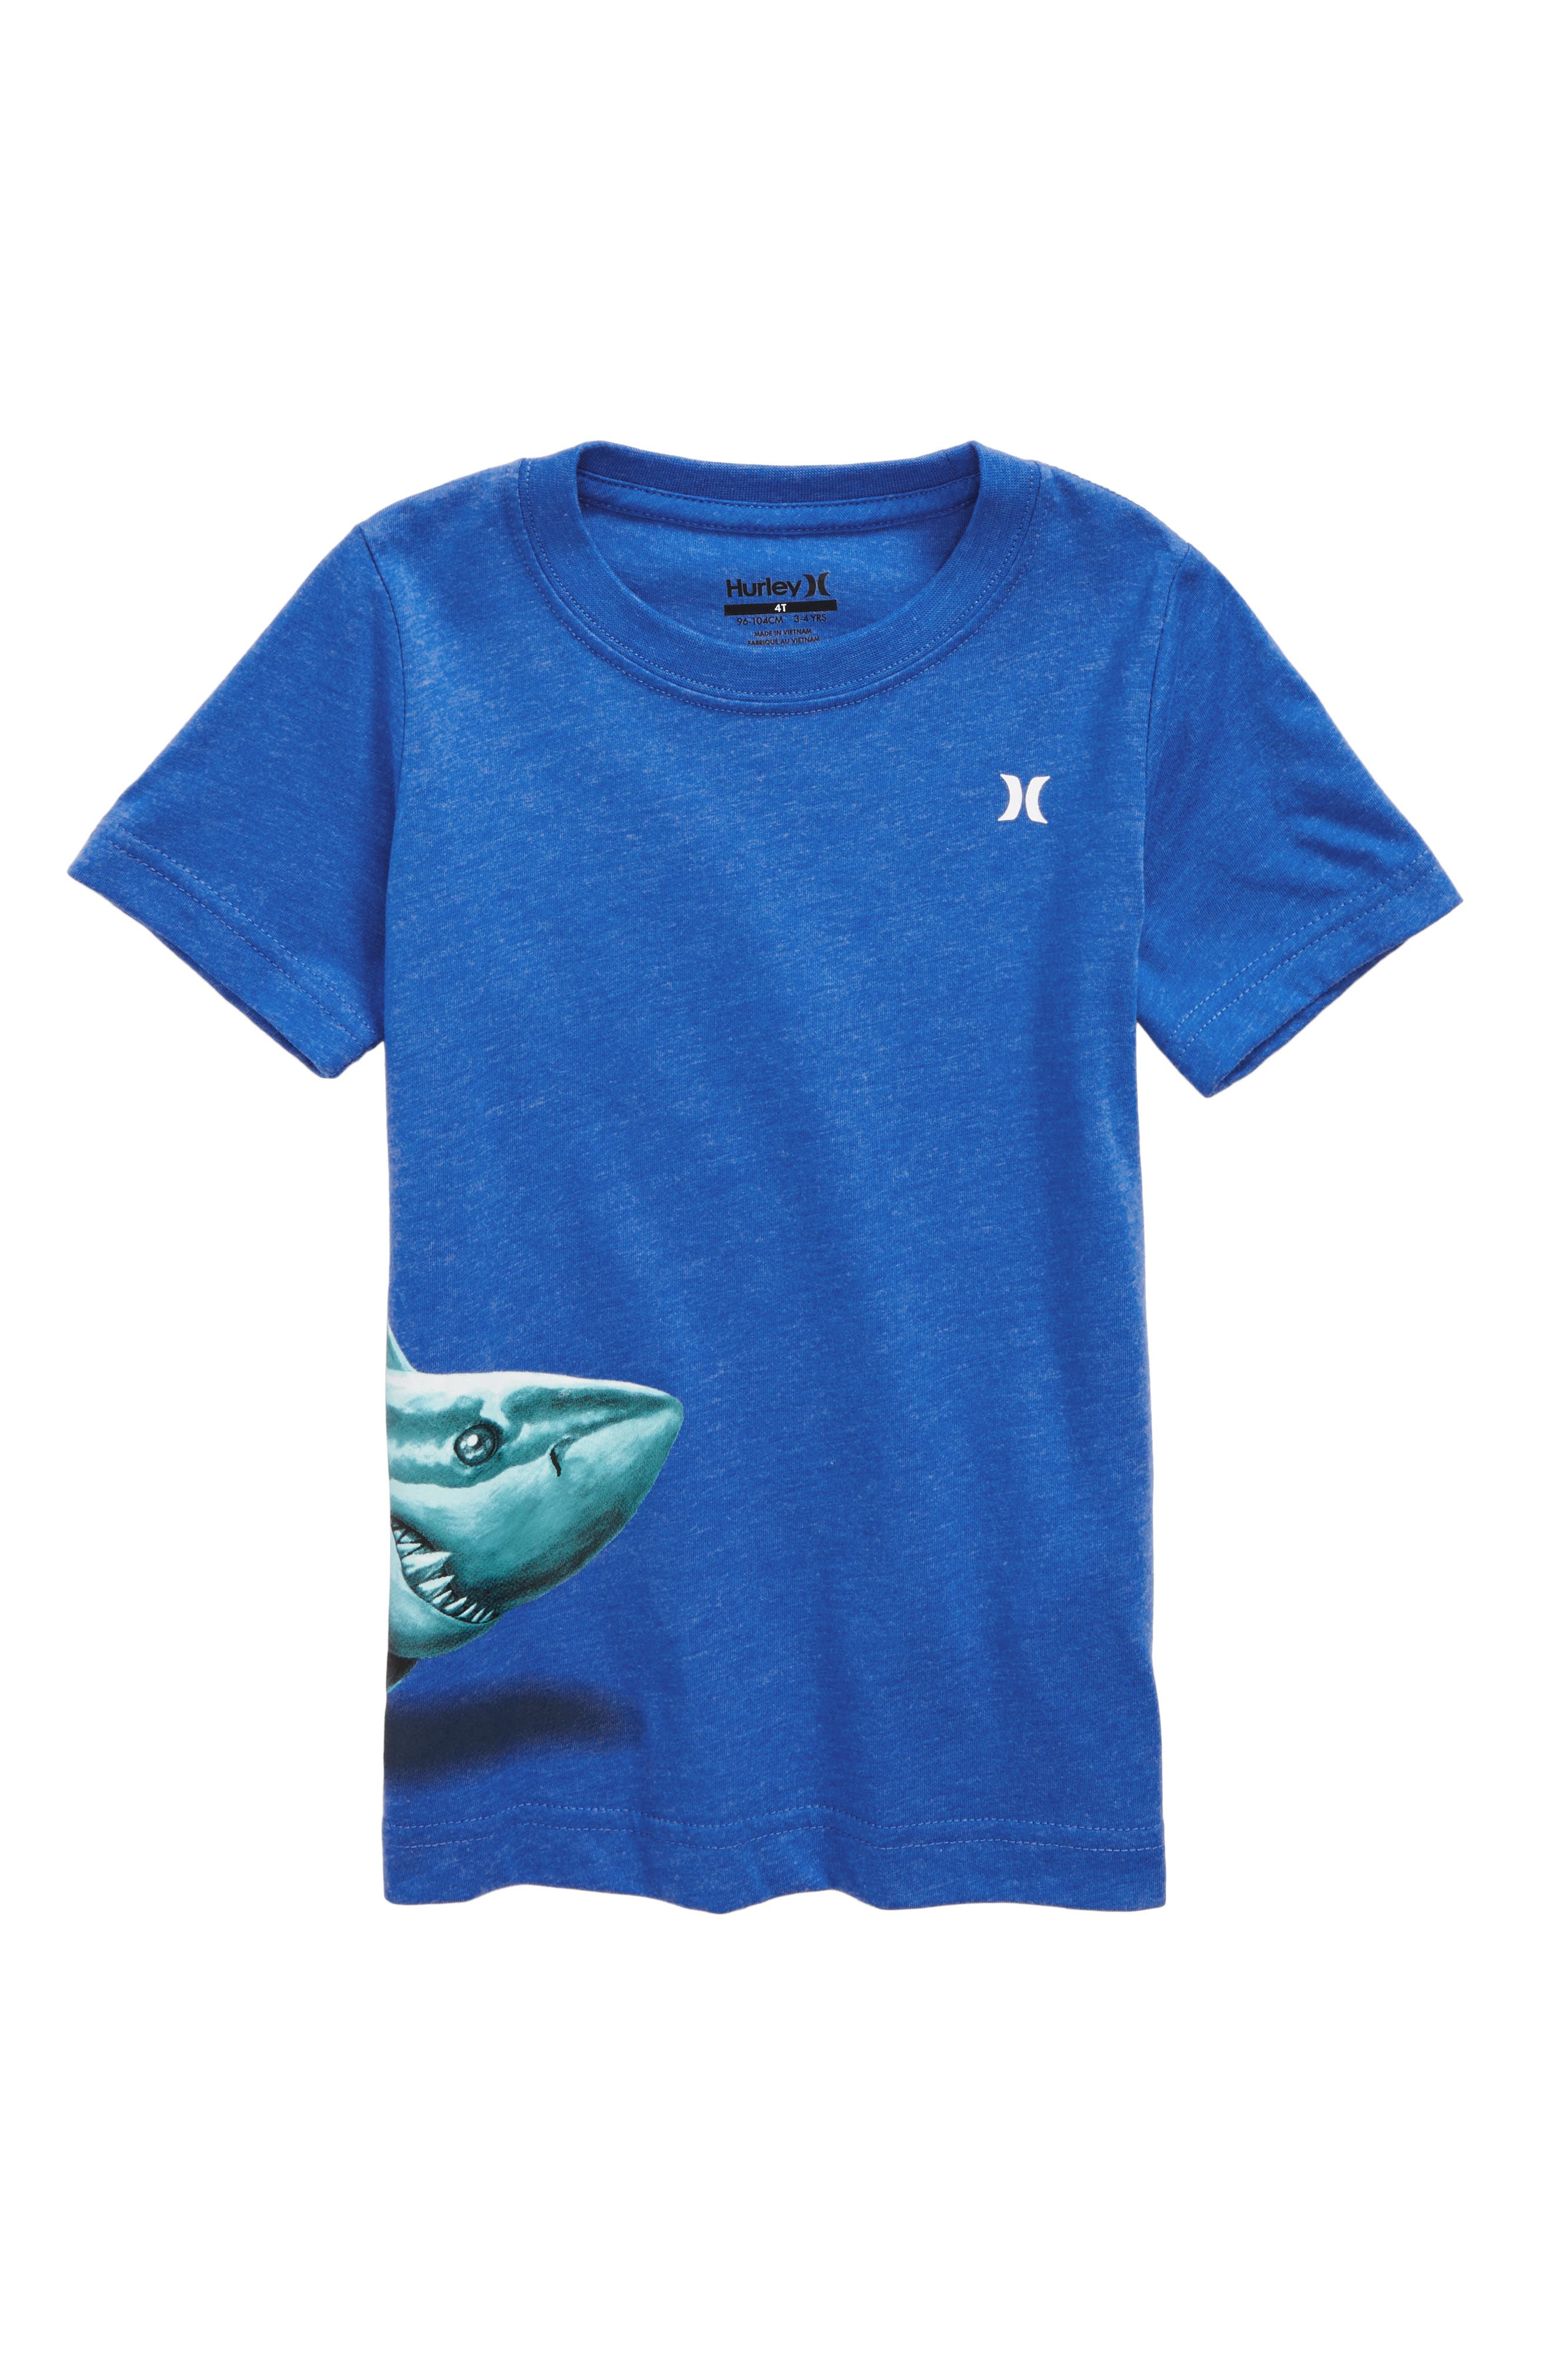 Sharky T-Shirt,                             Main thumbnail 1, color,                             Fountain Blue Heather